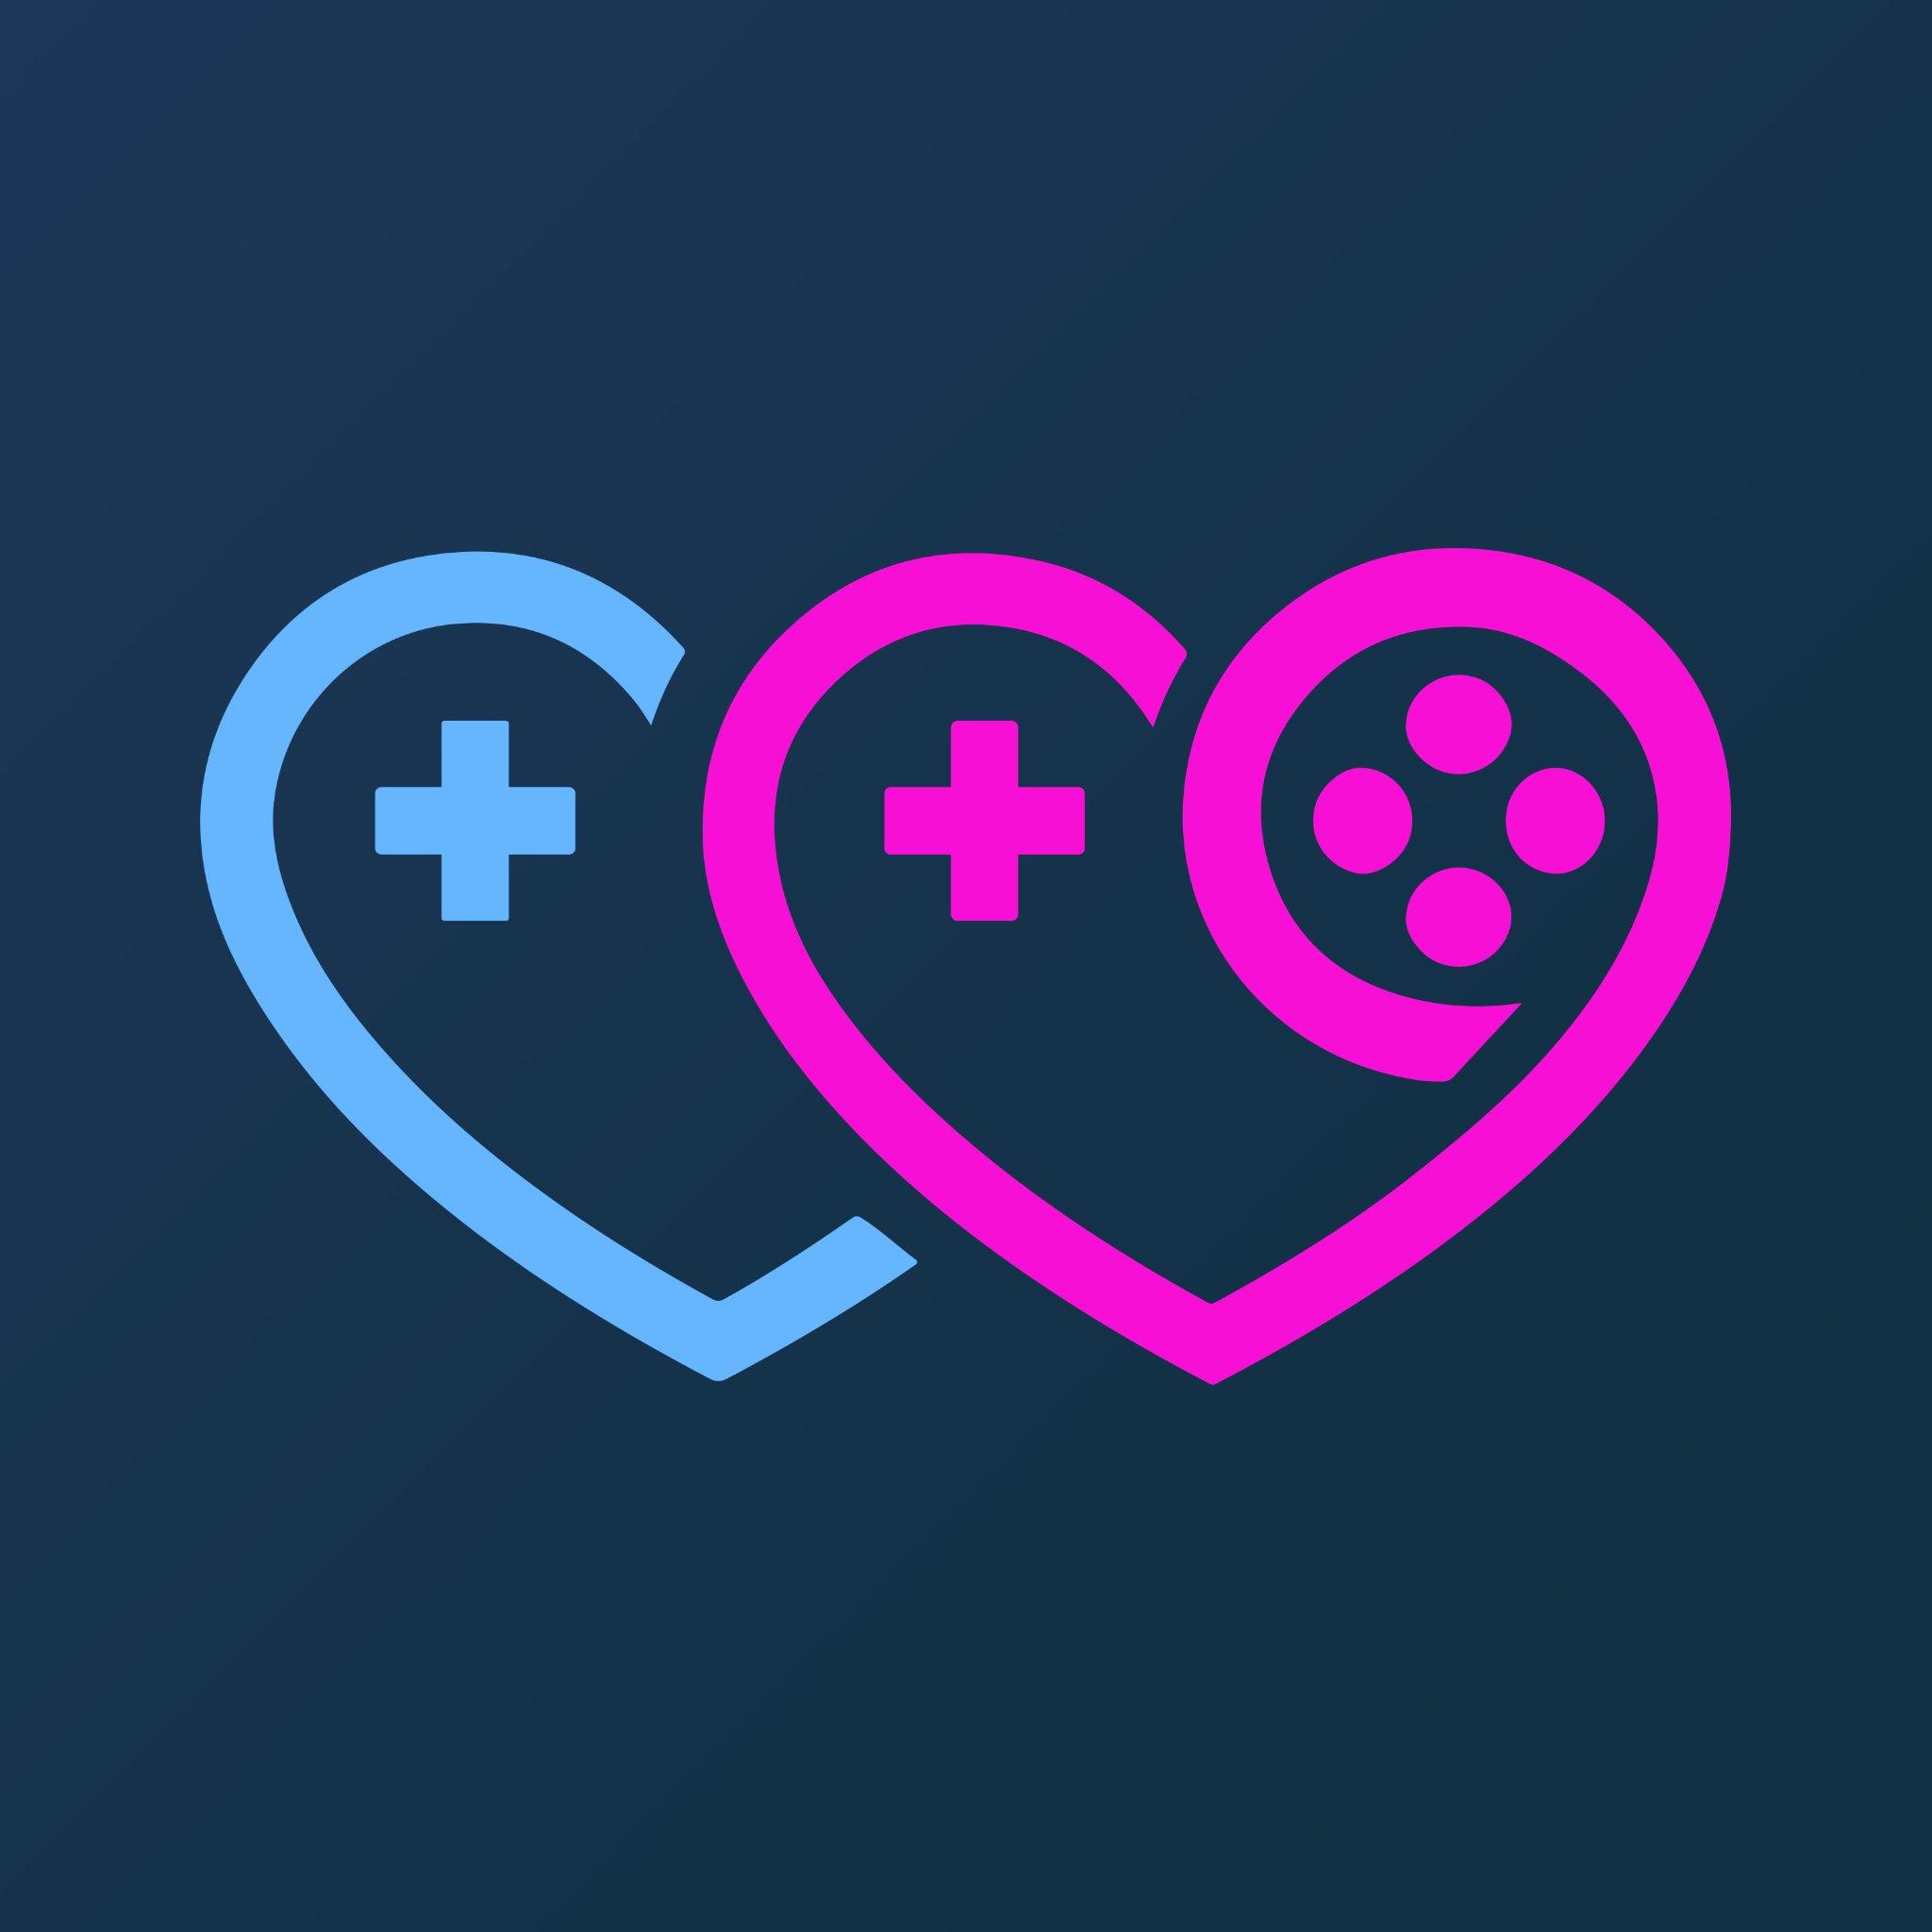 Making Dating & Quiz Trivia Browser Games: Creating Trivia